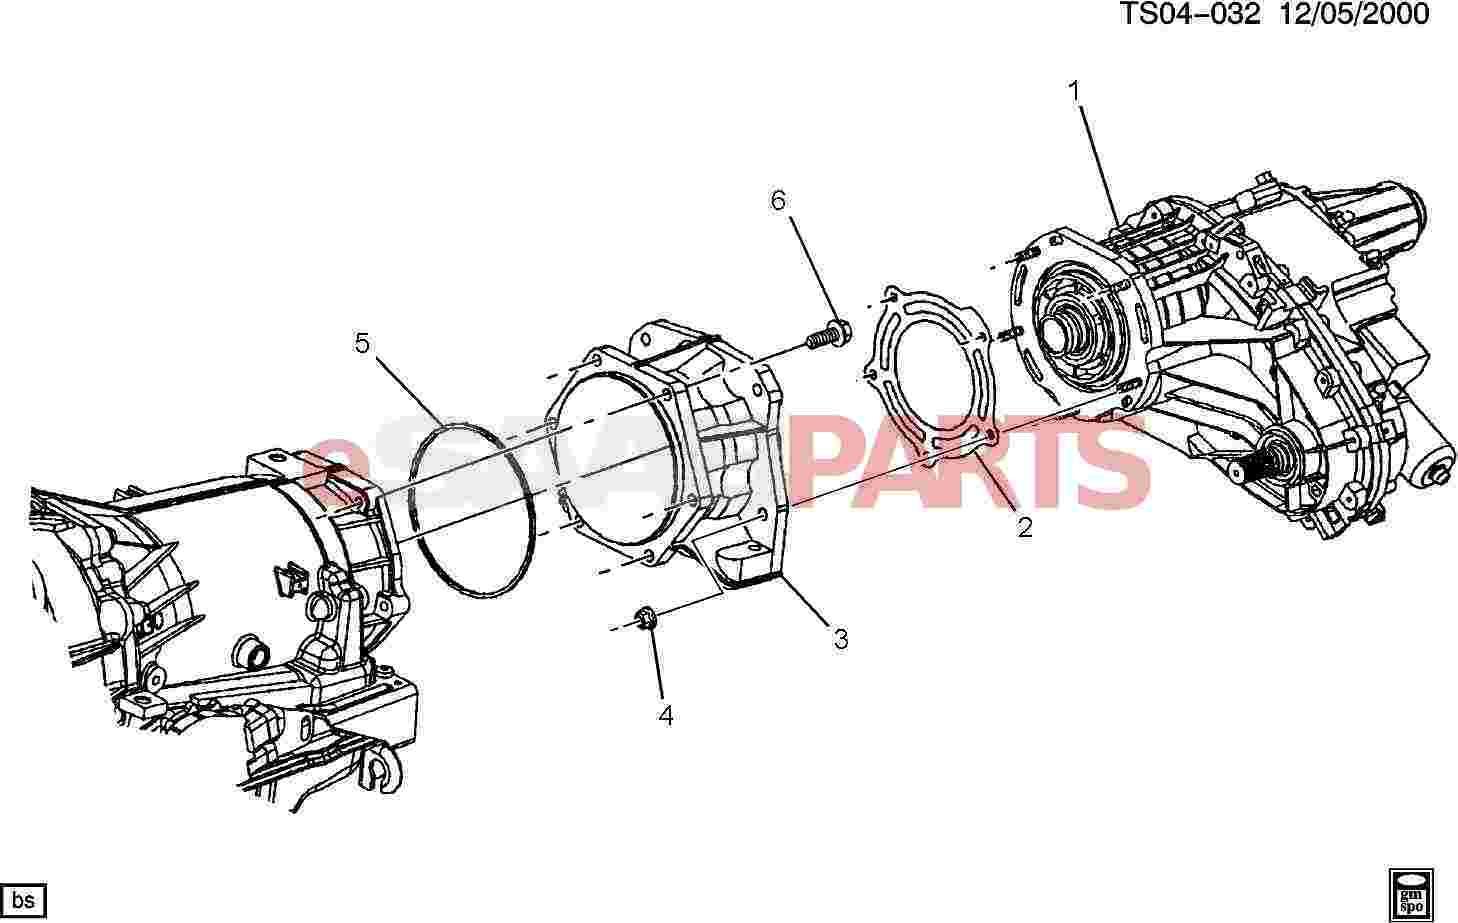 Saab Adapter Trfer Case